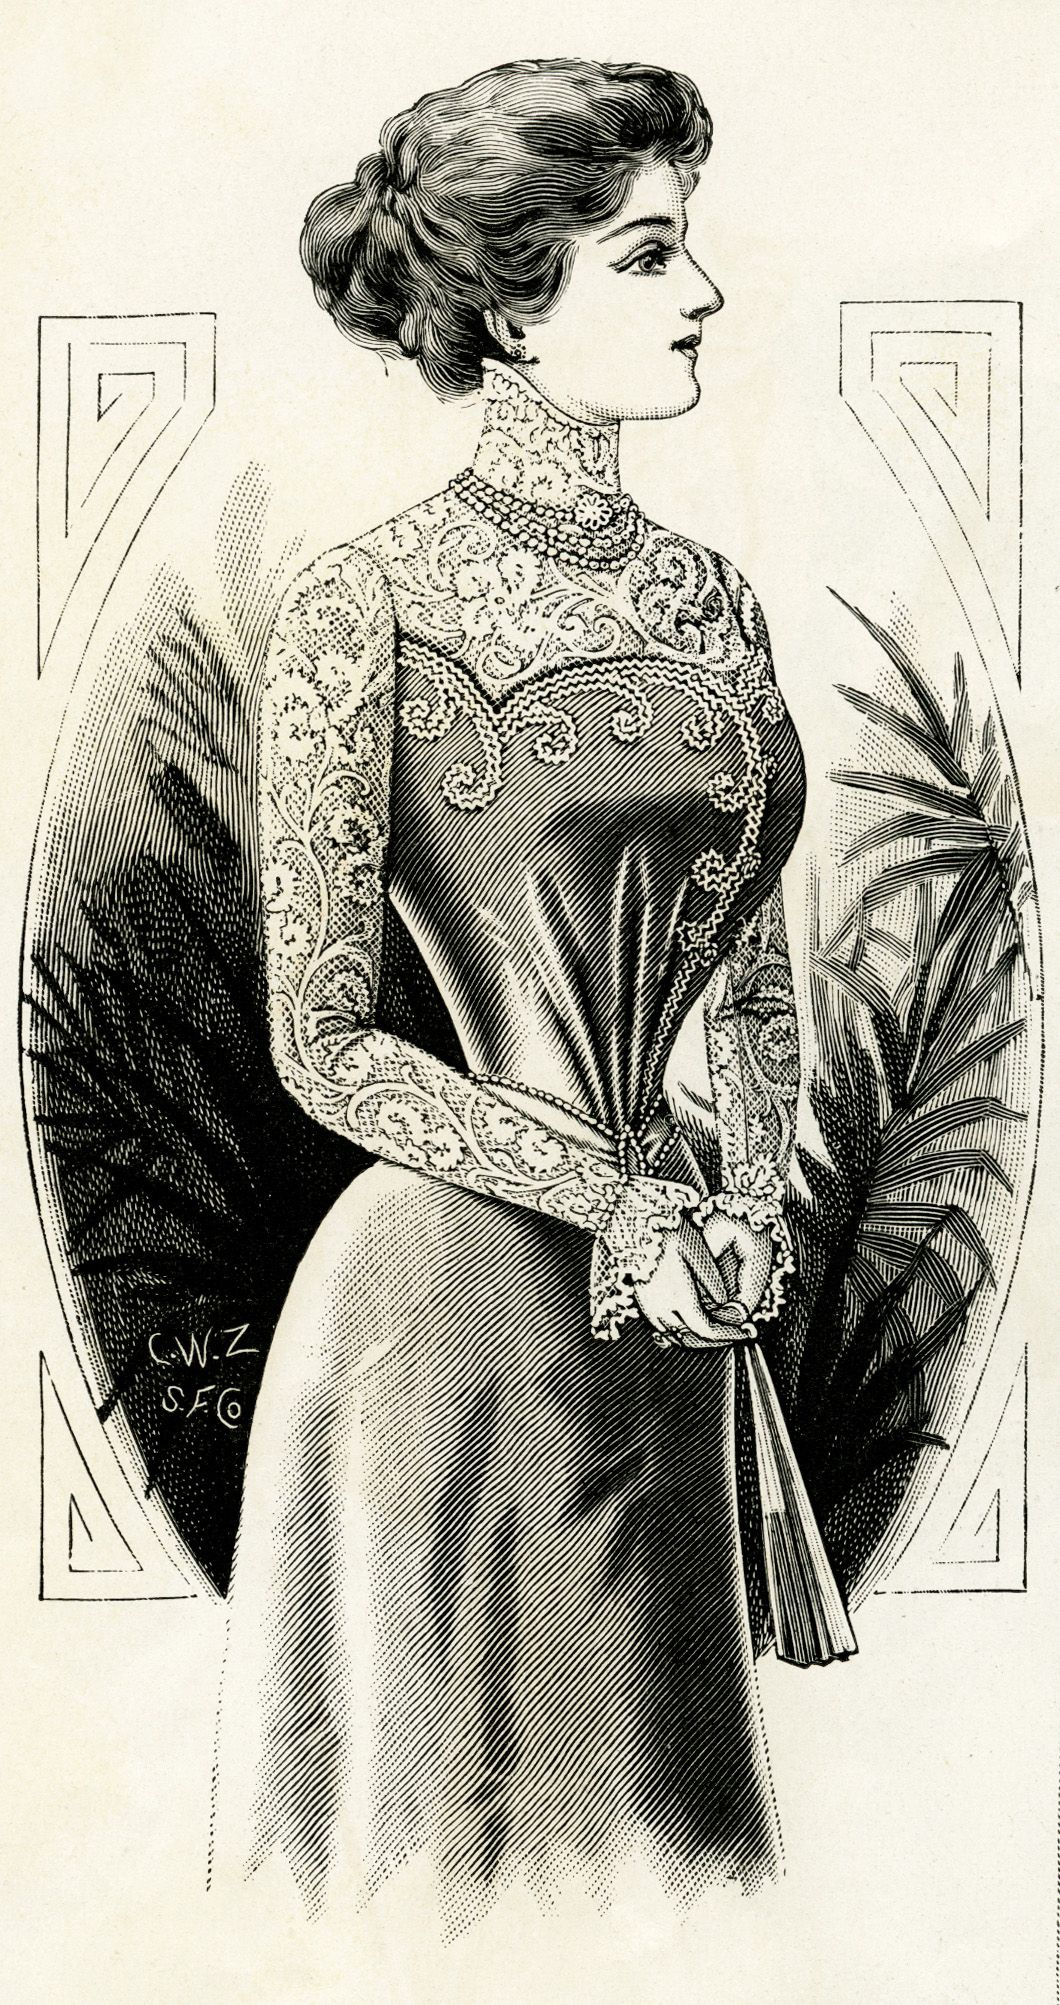 small resolution of victorian clipart public domain public domain digital image graphic design resource antique designer